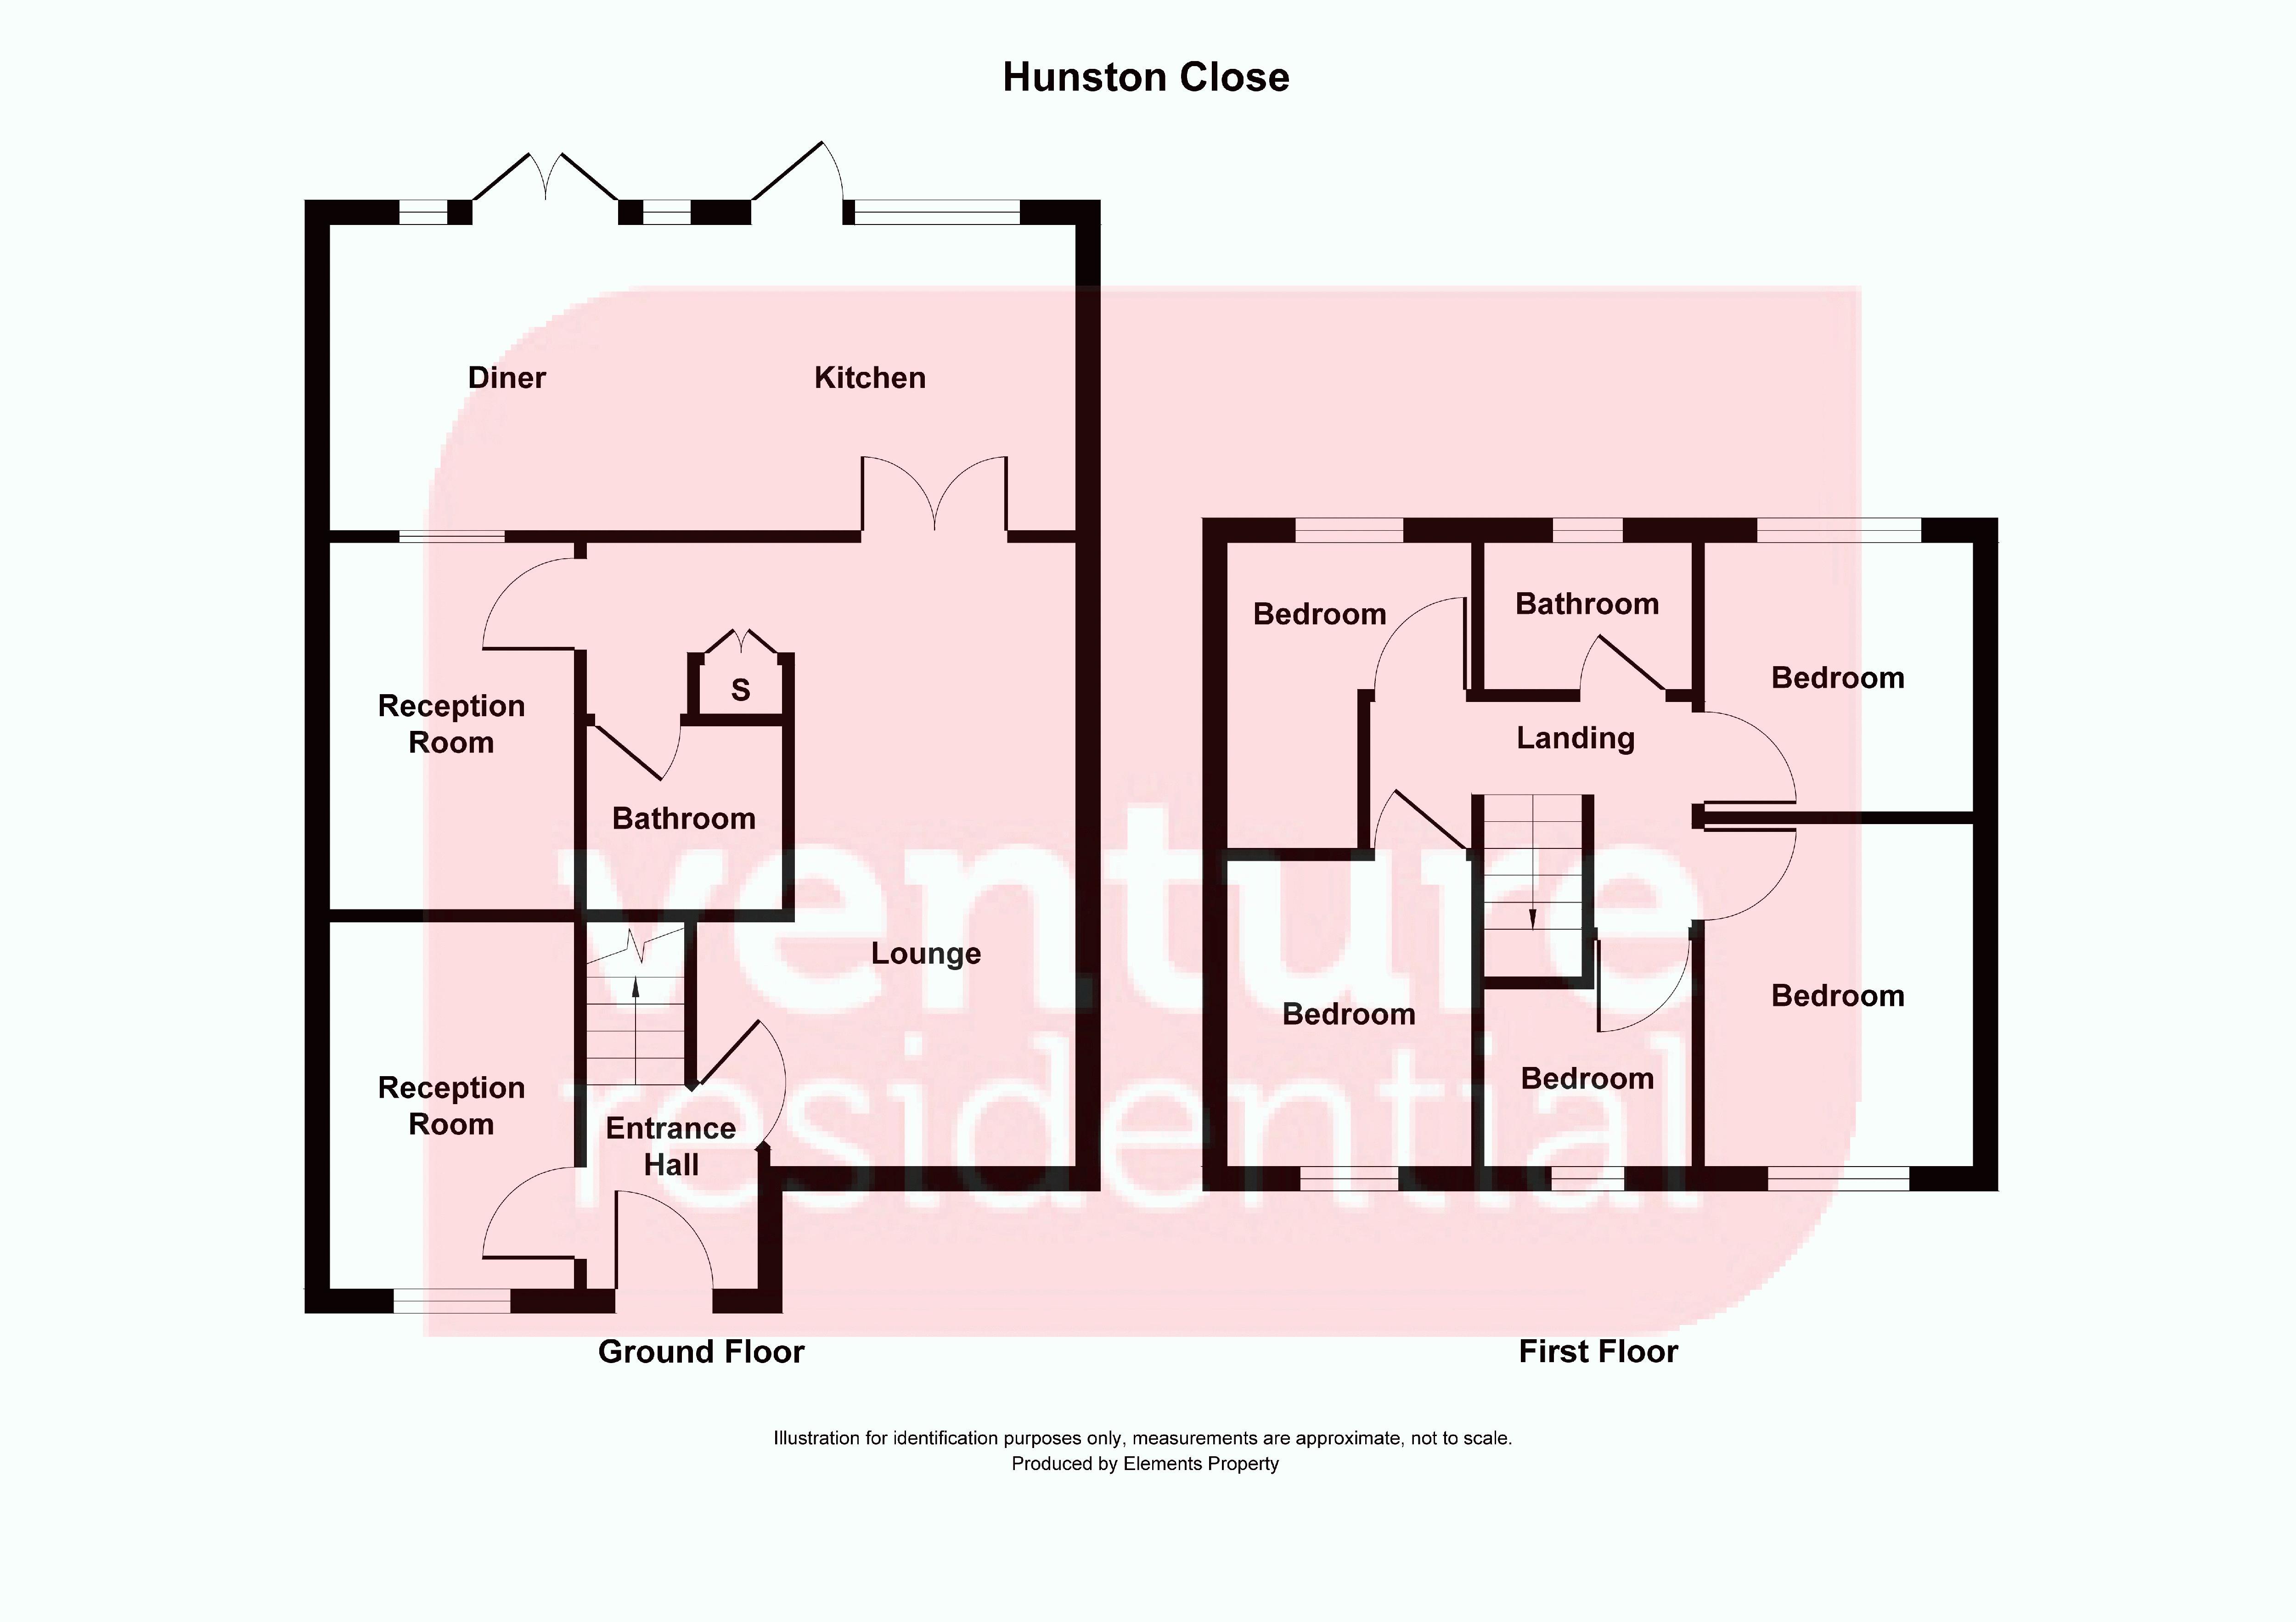 Hunston Close